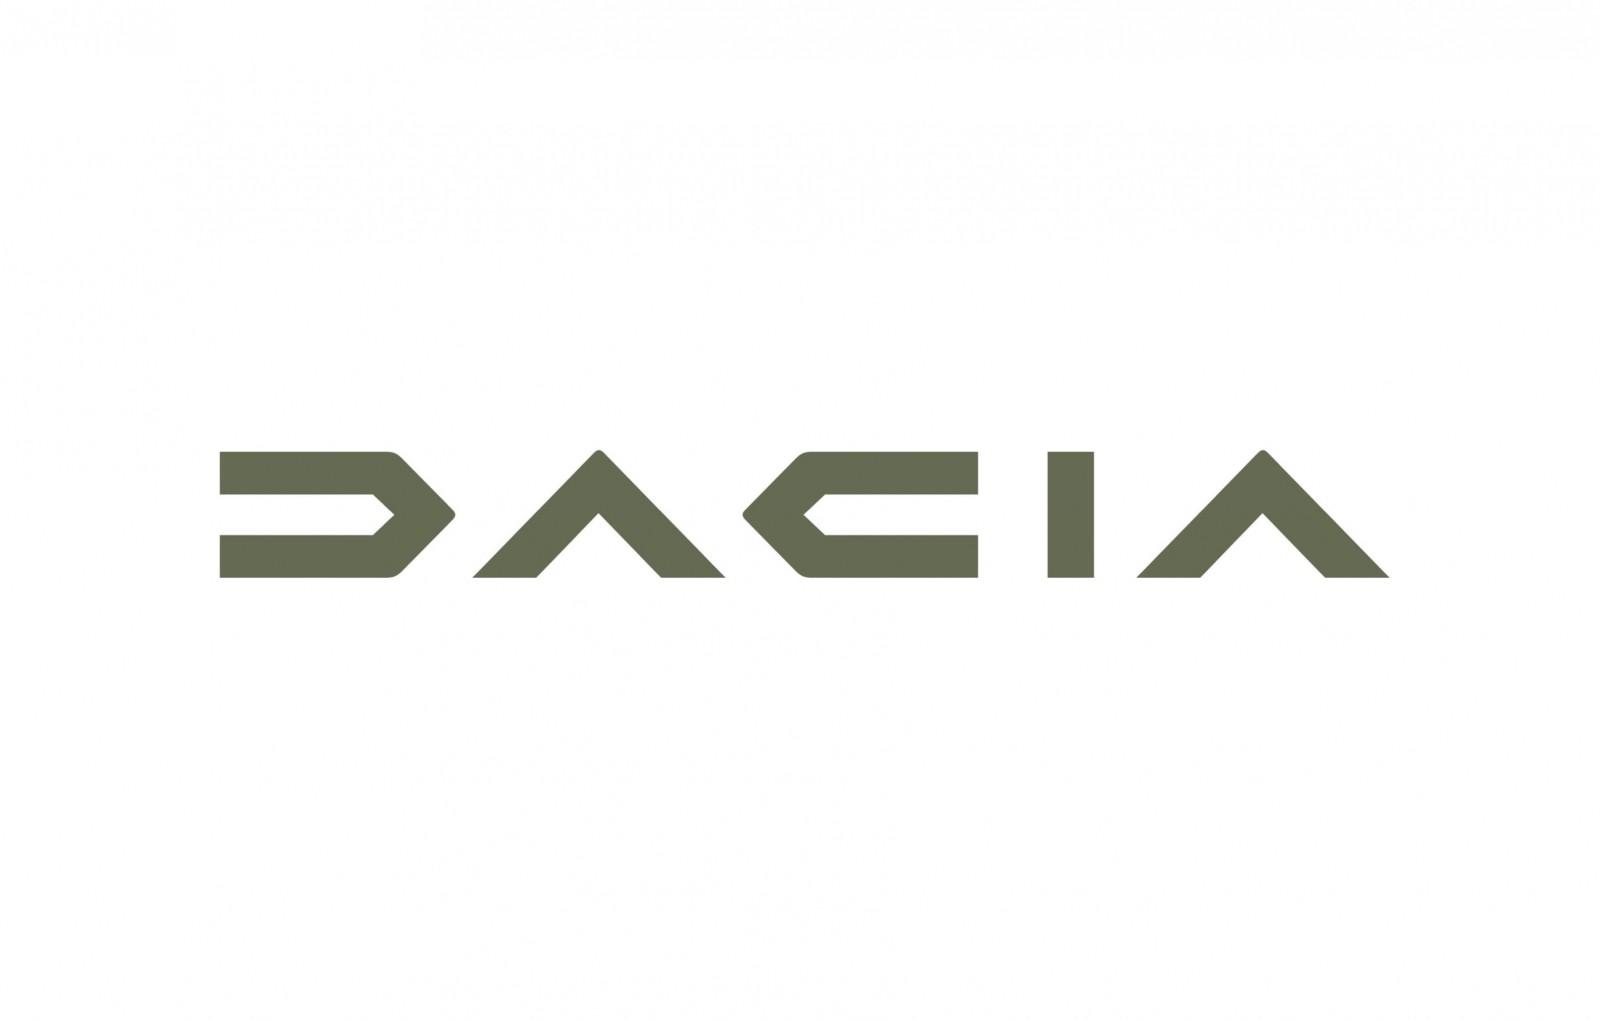 Dacia va avea incepand din acest an un nou logo si o identitate vizuala total schimbata